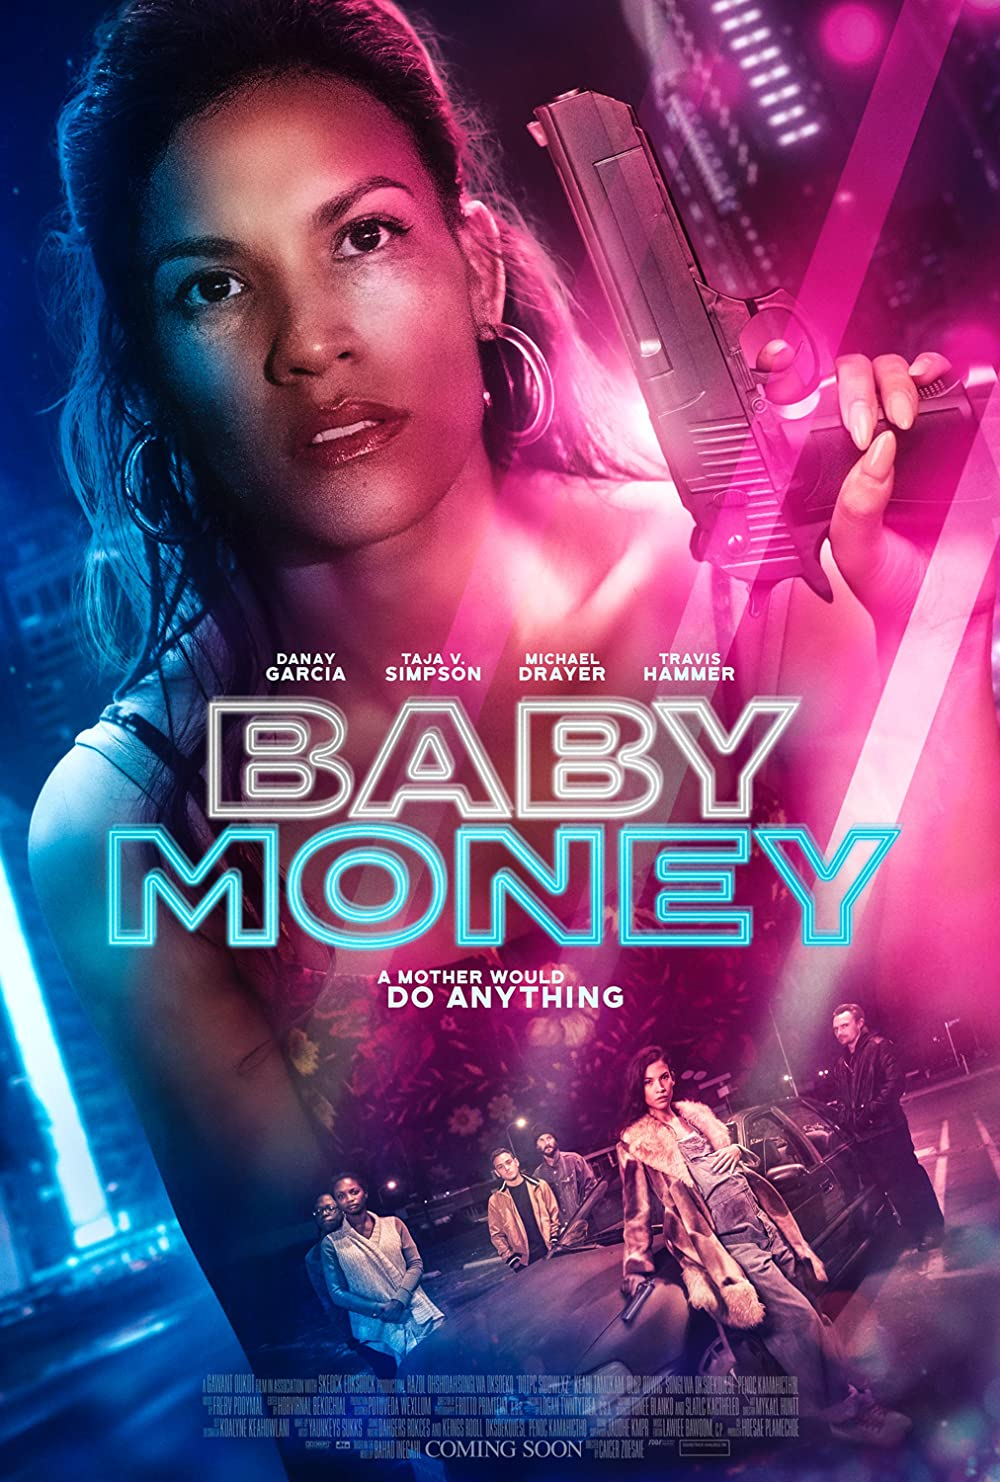 Download Baby Money (2021) Bengali Dubbed (Voice Over) WEBRip 720p [Full Movie] 1XBET FREE on 1XCinema.com & KatMovieHD.sk